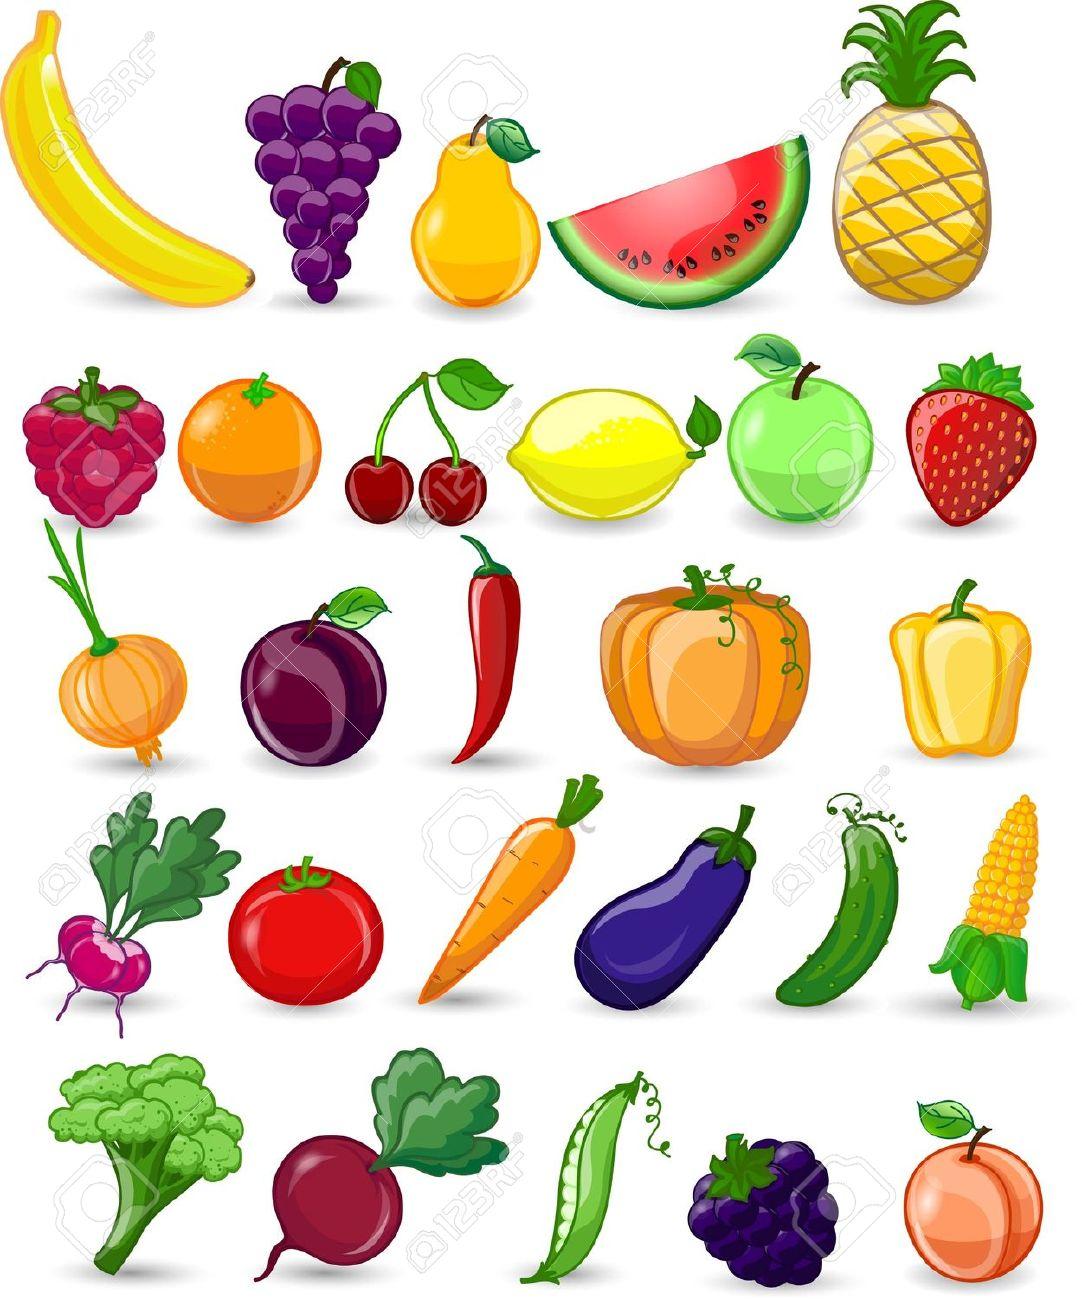 Frutta e verdura clipart.